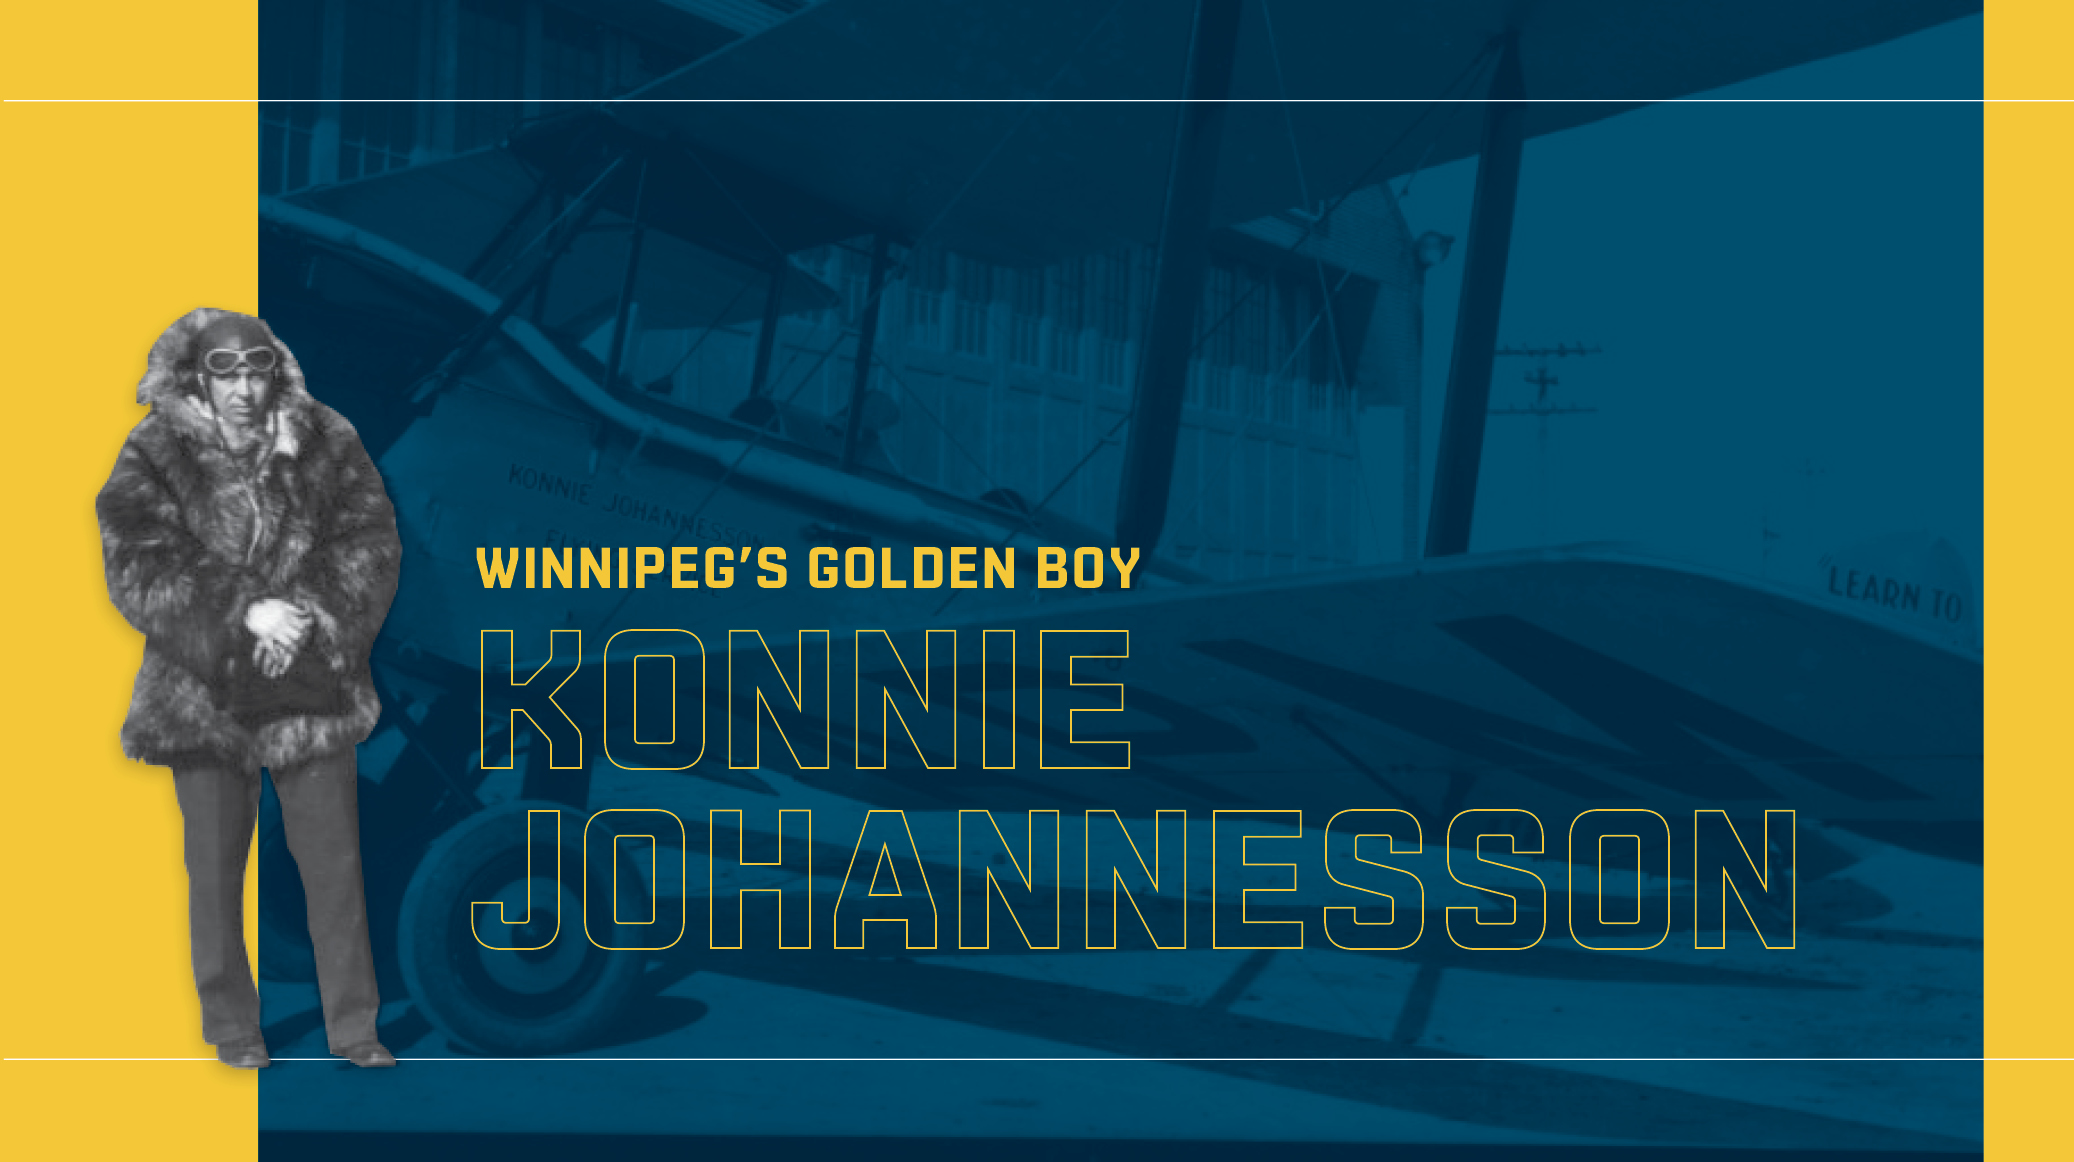 Konnie Johannesson